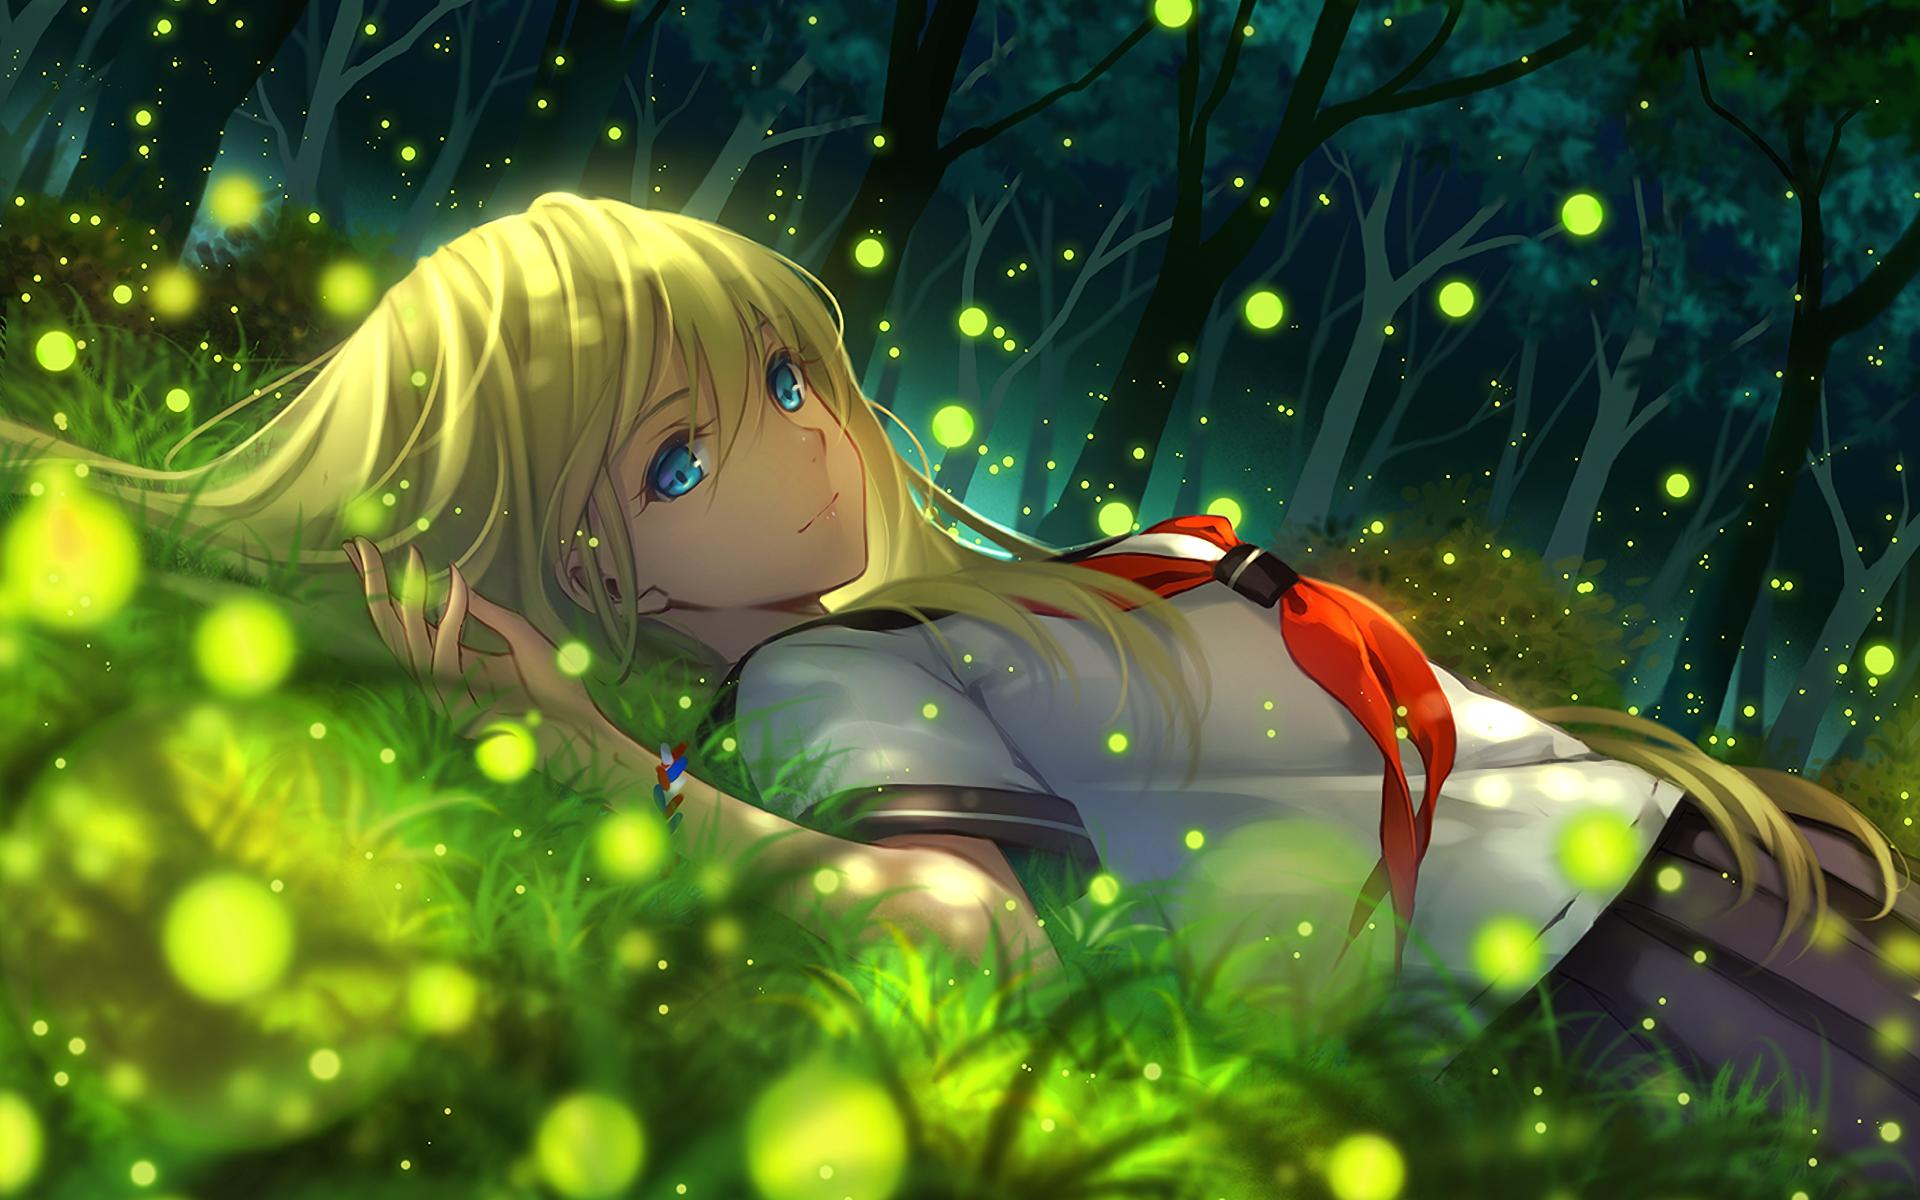 Dj Girl Wallpaper Hd Anime Music Wallpapers Hd Pixelstalk Net